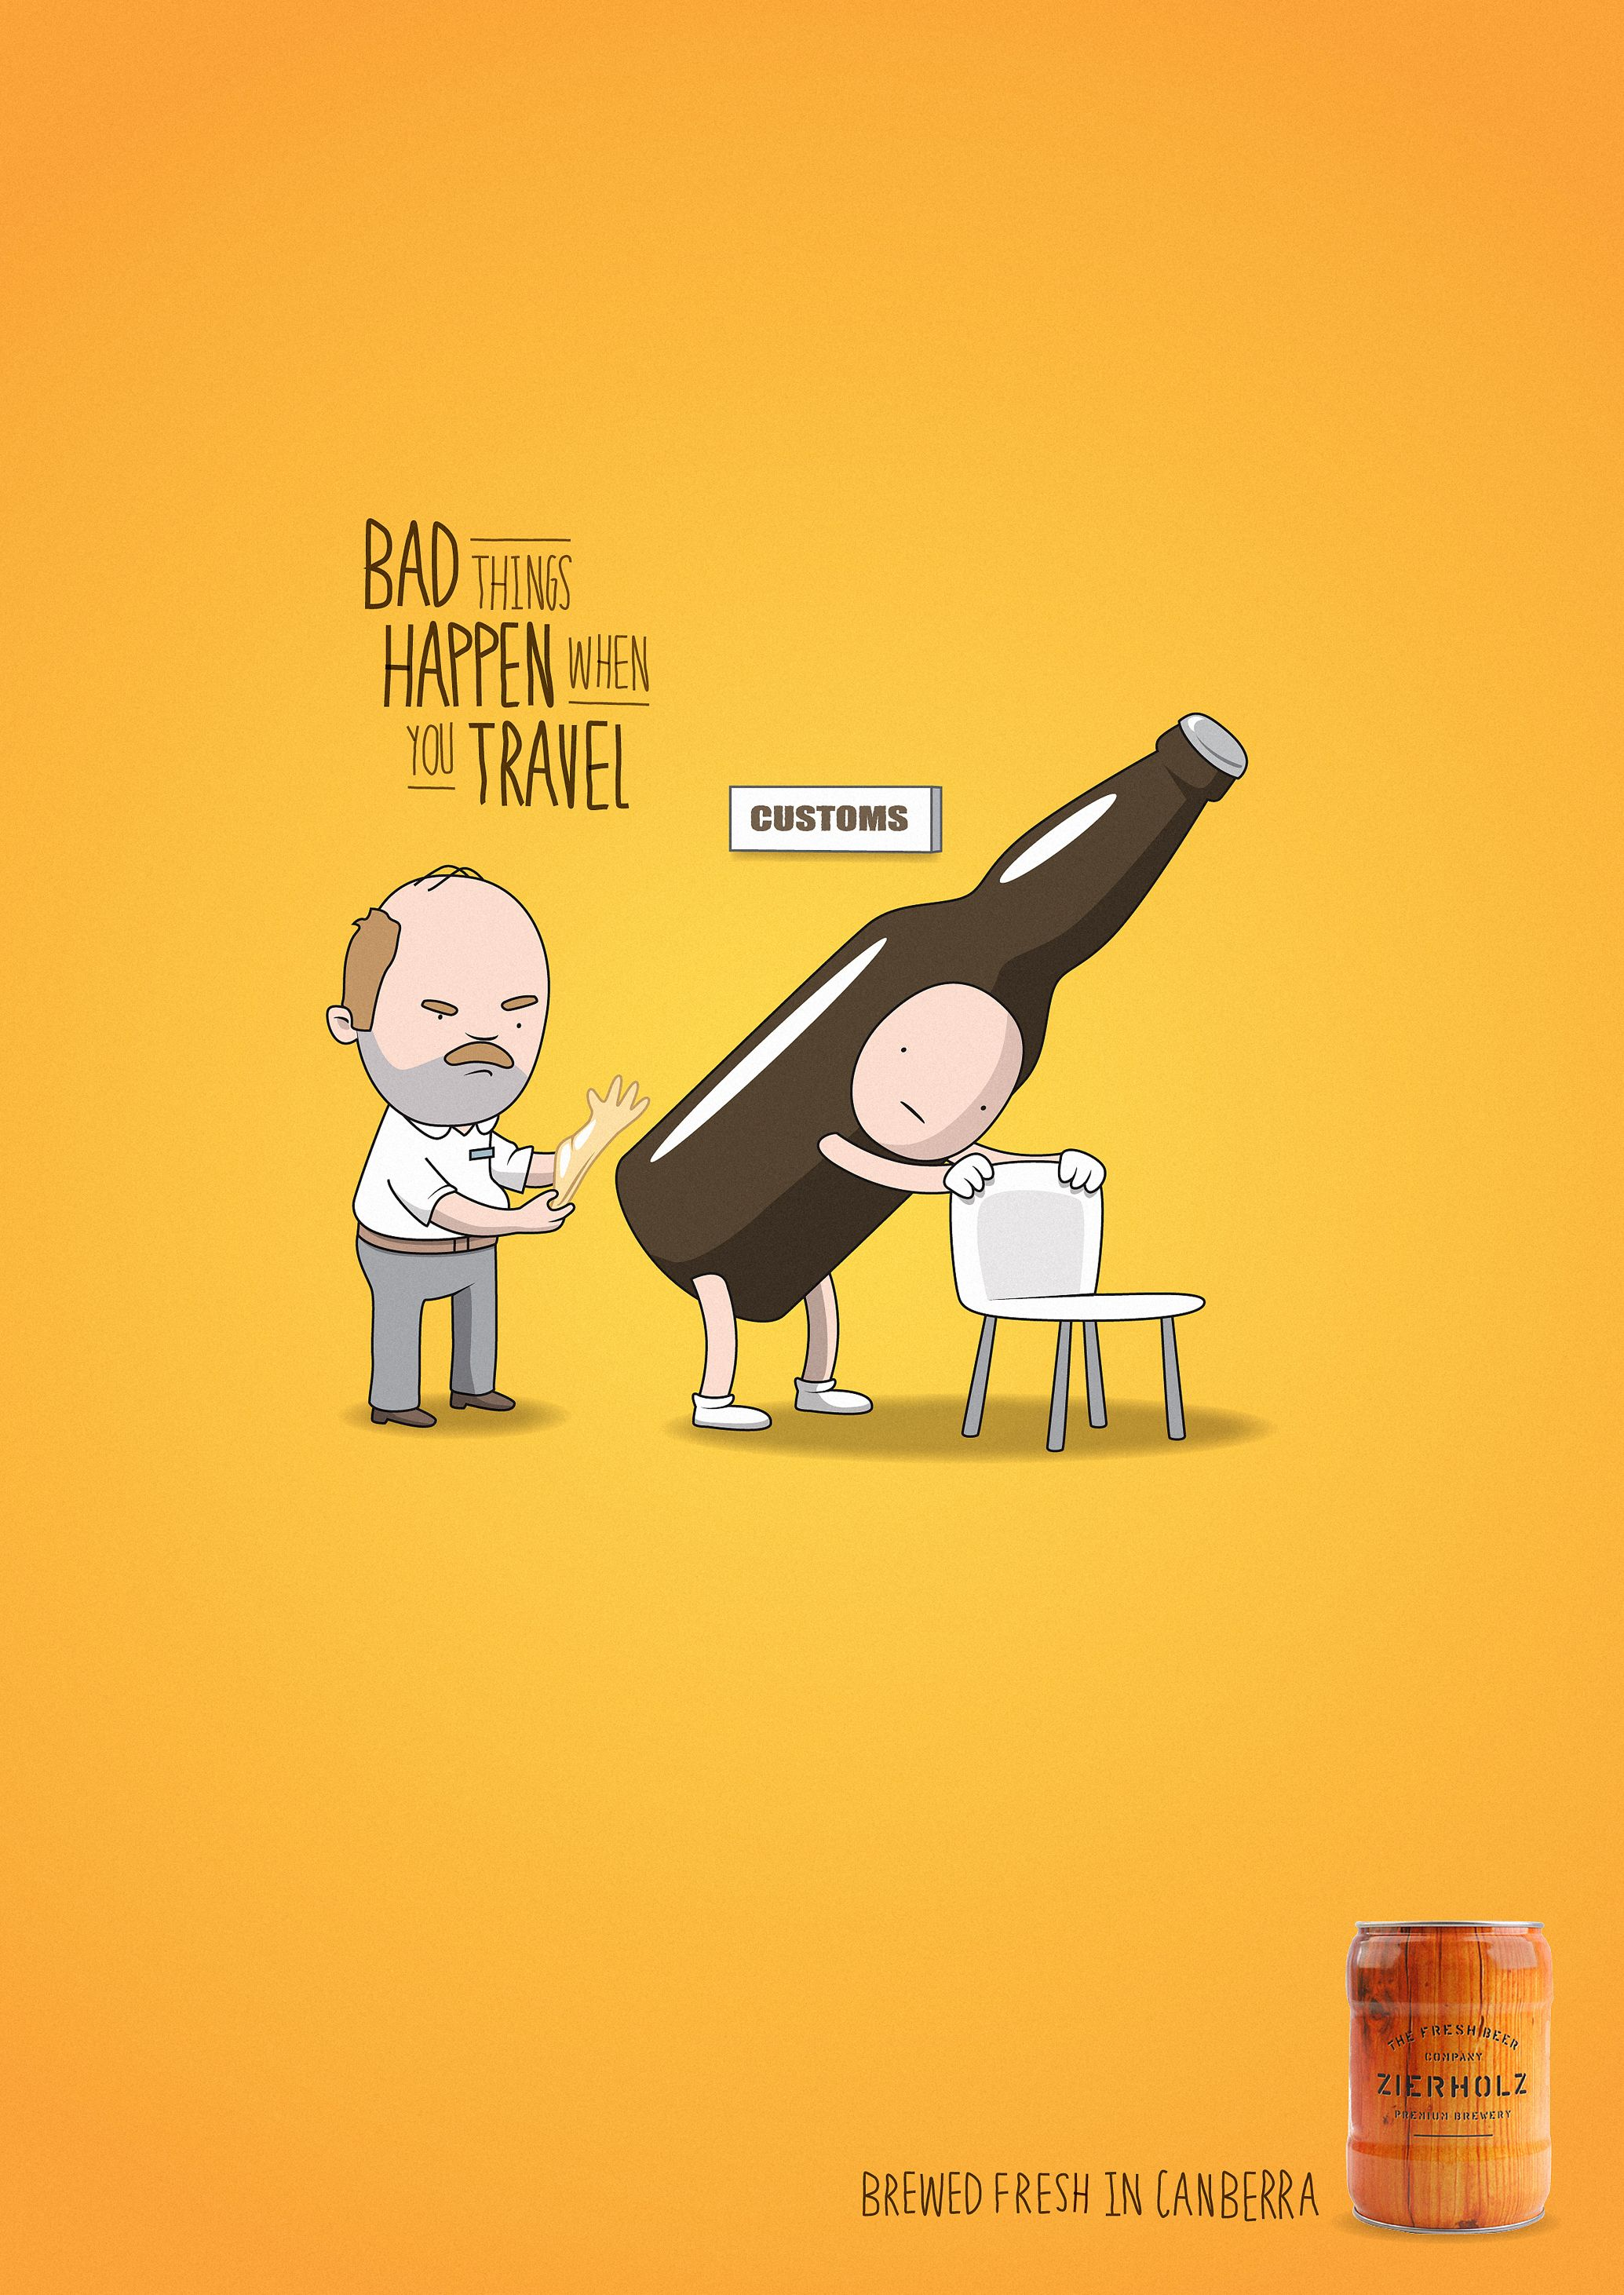 15 Best Print Ads of 2012 | creative ads | Pinterest | Ads